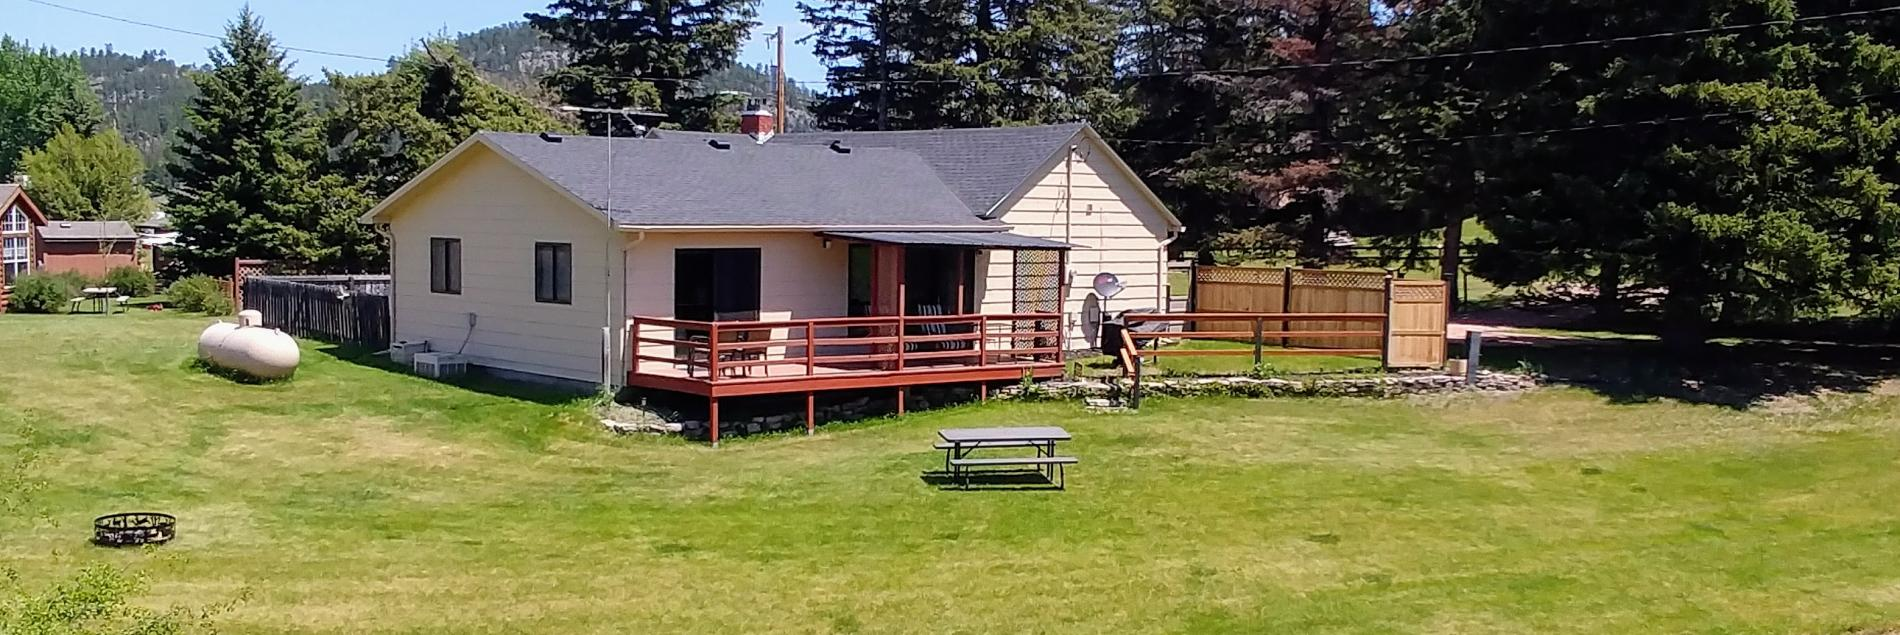 Creekside Country Resort